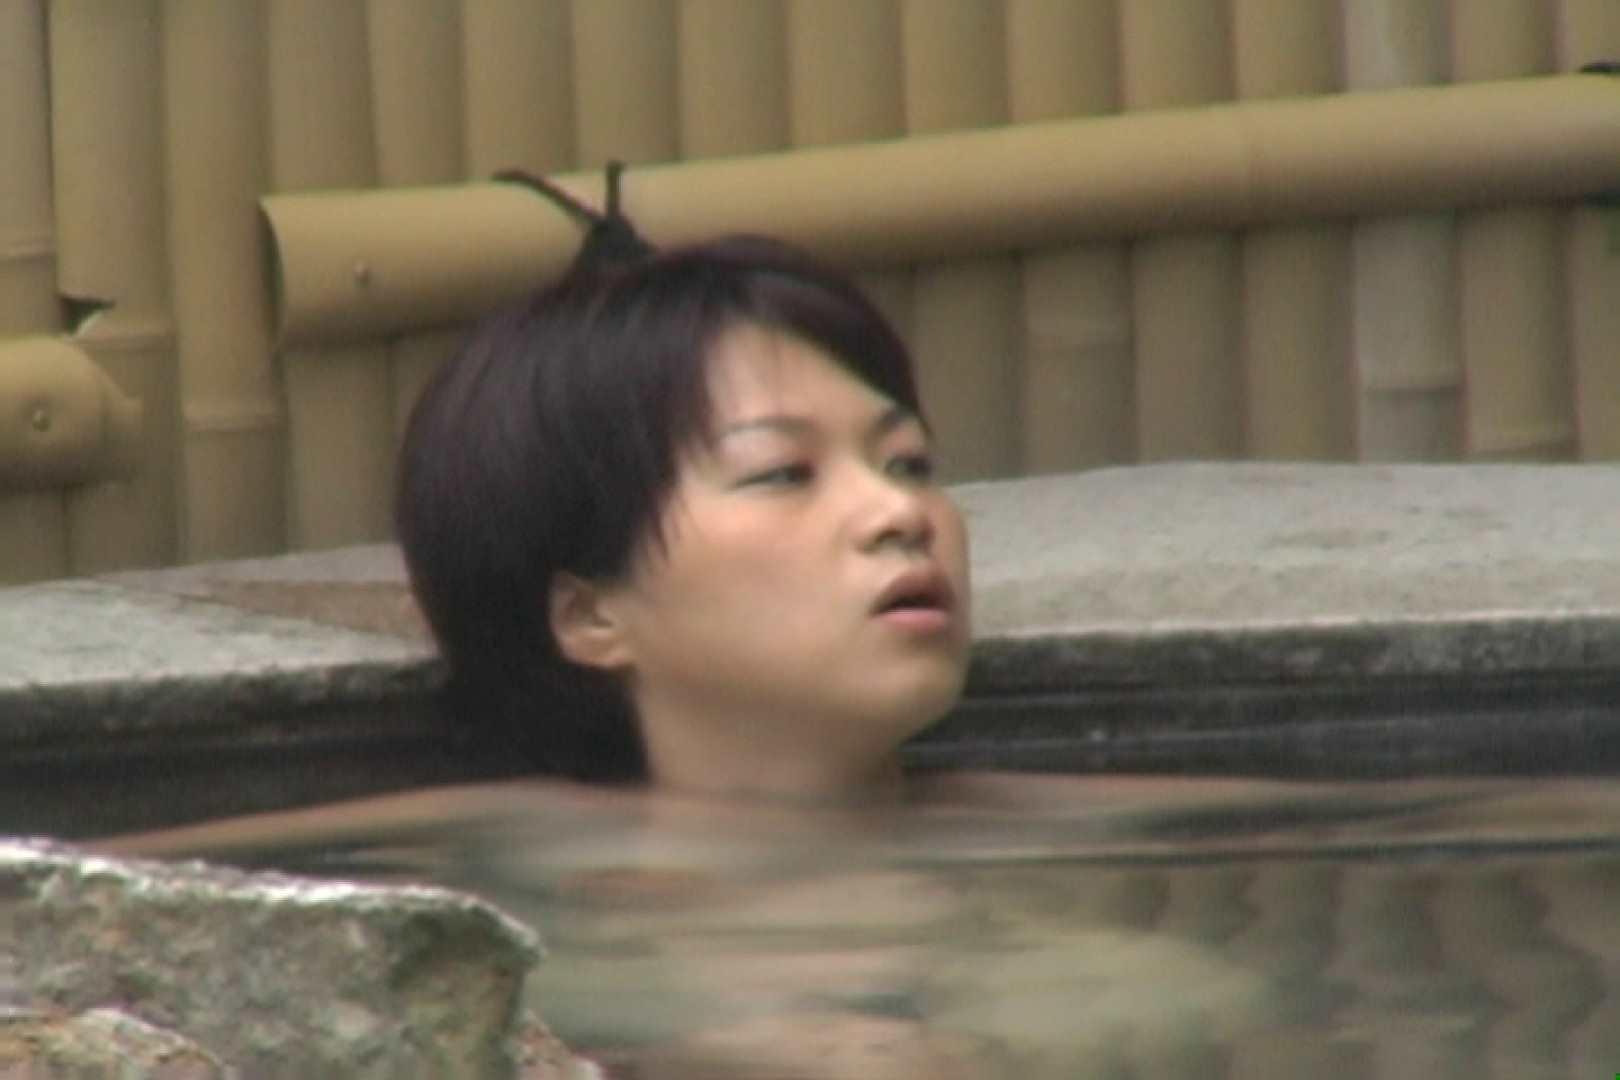 Aquaな露天風呂Vol.624 OLのエロ生活   露天風呂  41連発 19